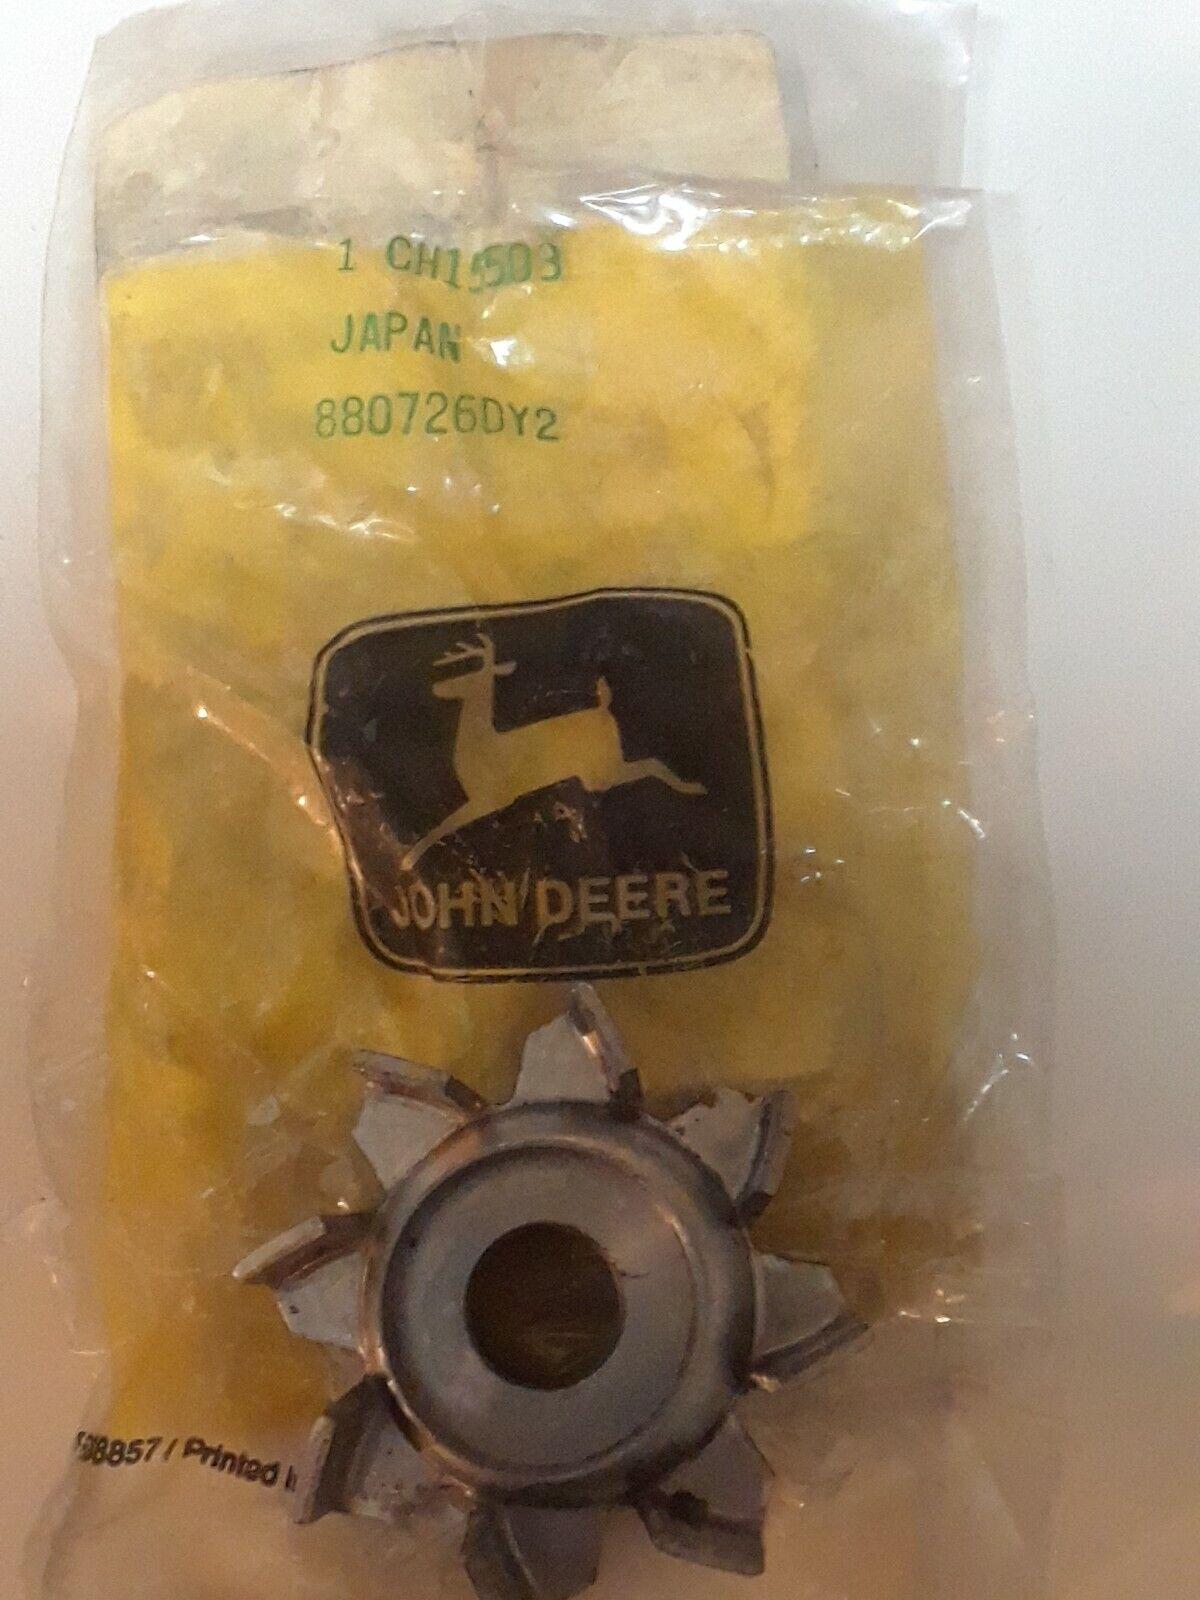 JOHN DEERE CH15503 750 Tractor impellar bomba de agua